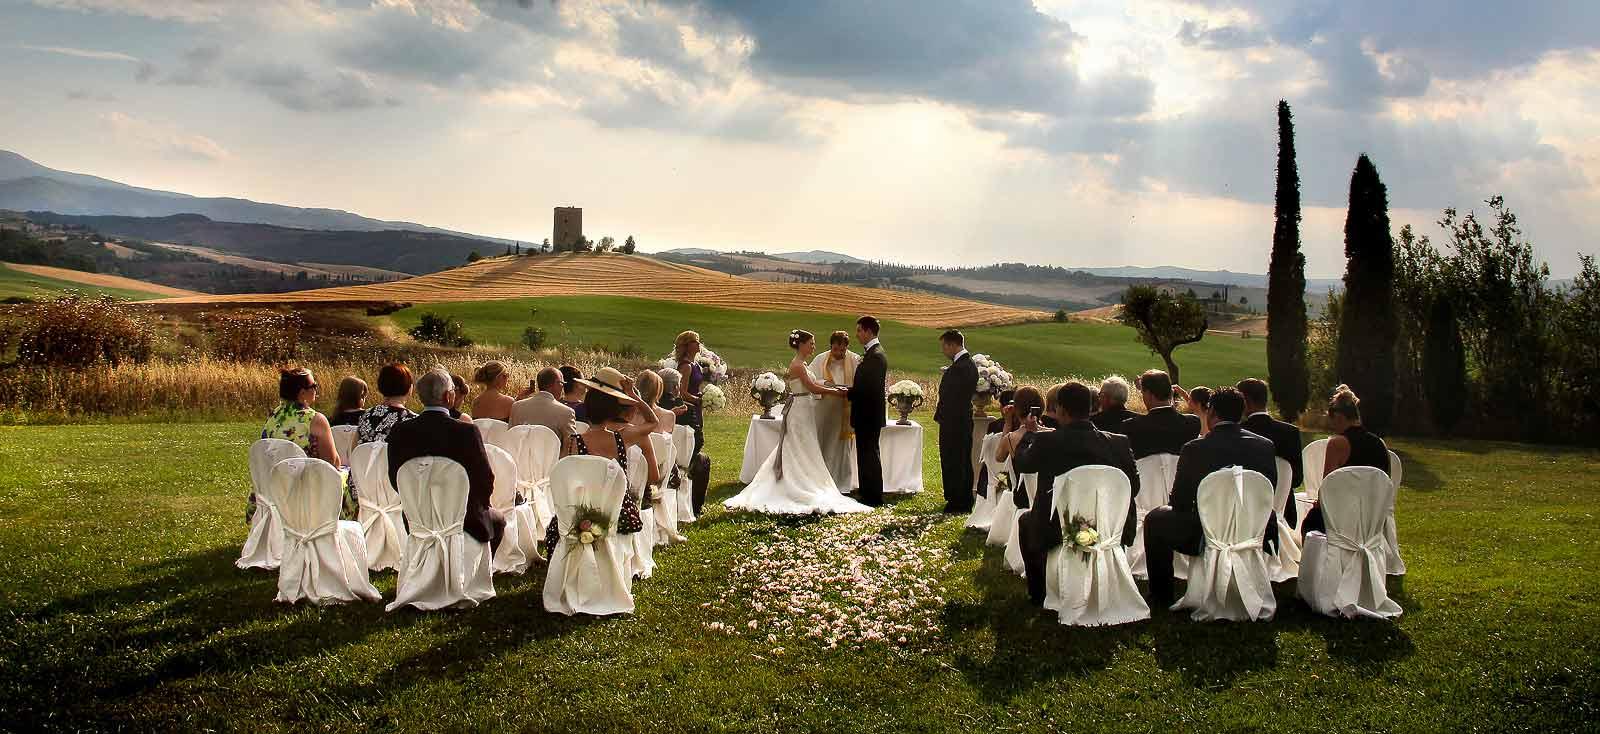 Weddings In Italy Destination Wedding In Tuscany Amalfi Coast Rome Lakes Beaches